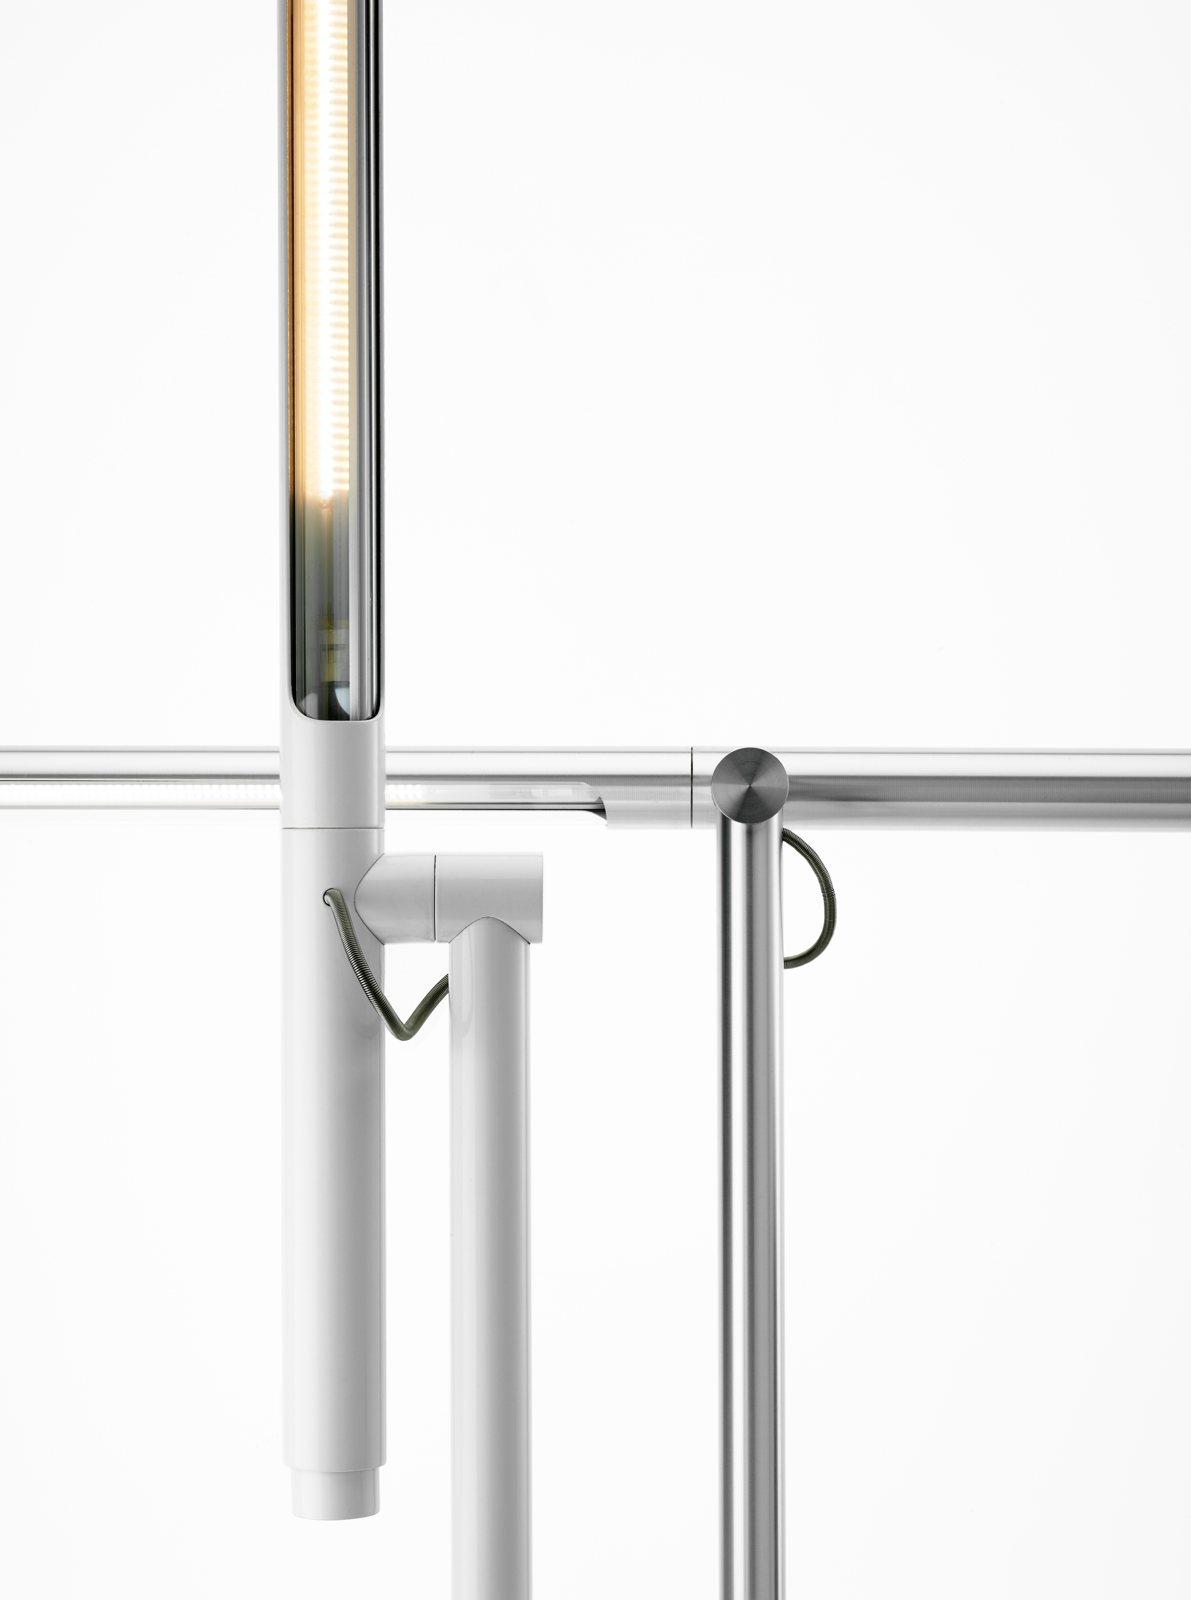 Brazo Floor Lamp By Pablo Pardo For Pablo Up Interiors